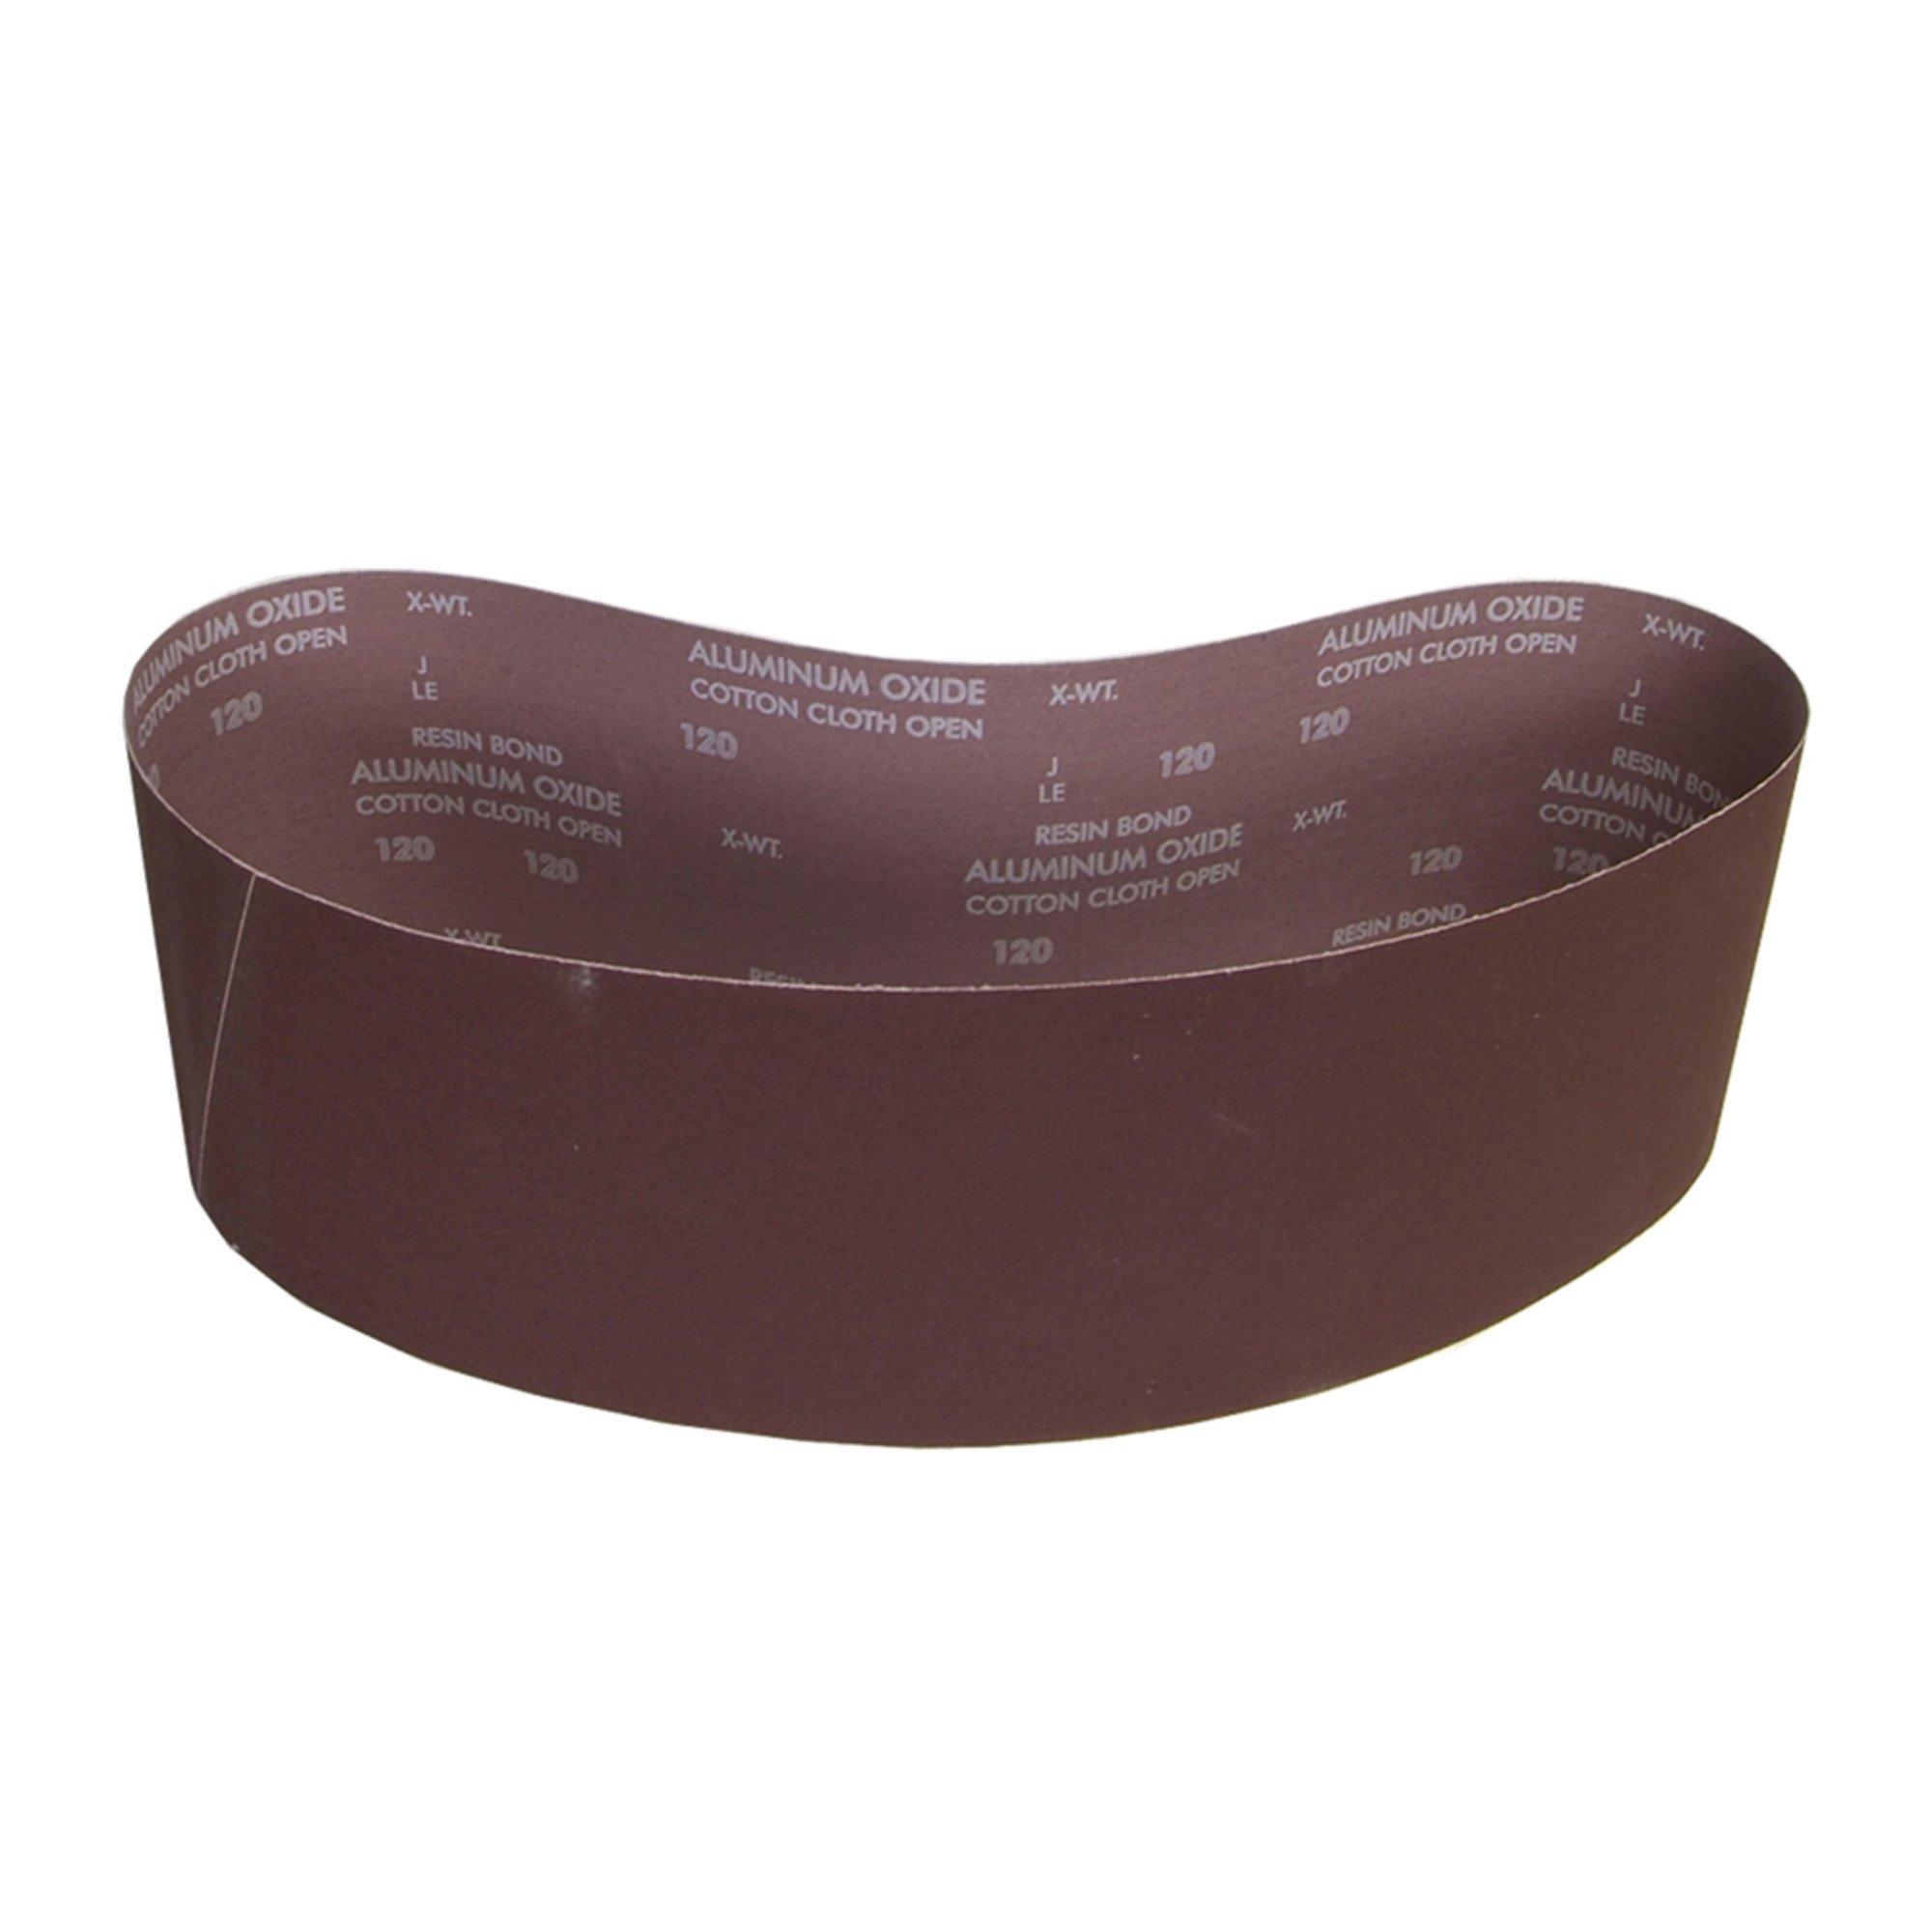 Norton 78072727987 BenchStand Abrasive Belt, Cotton Fiber Backing, Aluminum Oxide, 48'' Length x 6'' Width, Grit 36X Extra Coarse (Pack of 10)